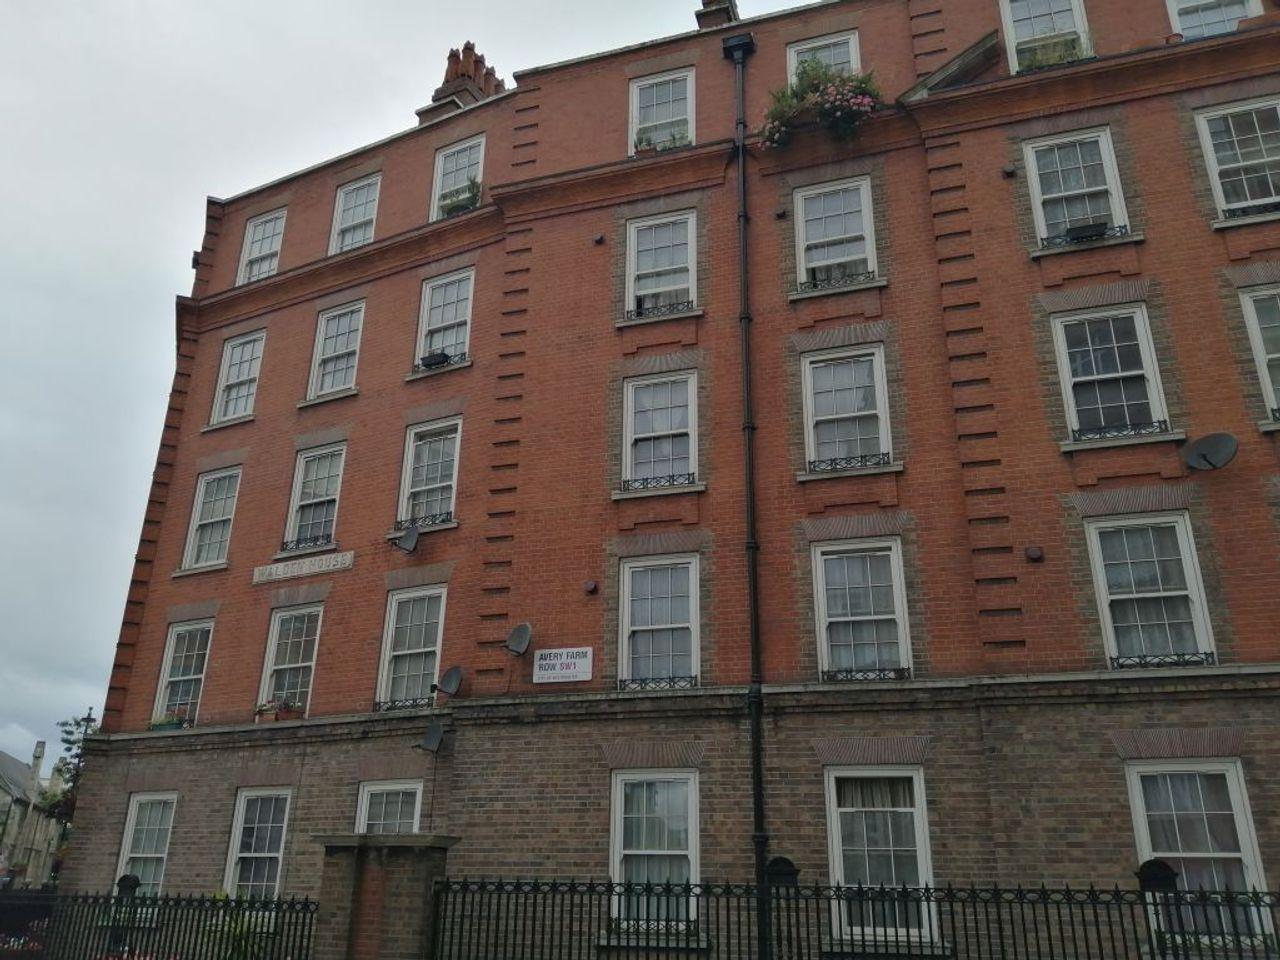 The Walden House flats